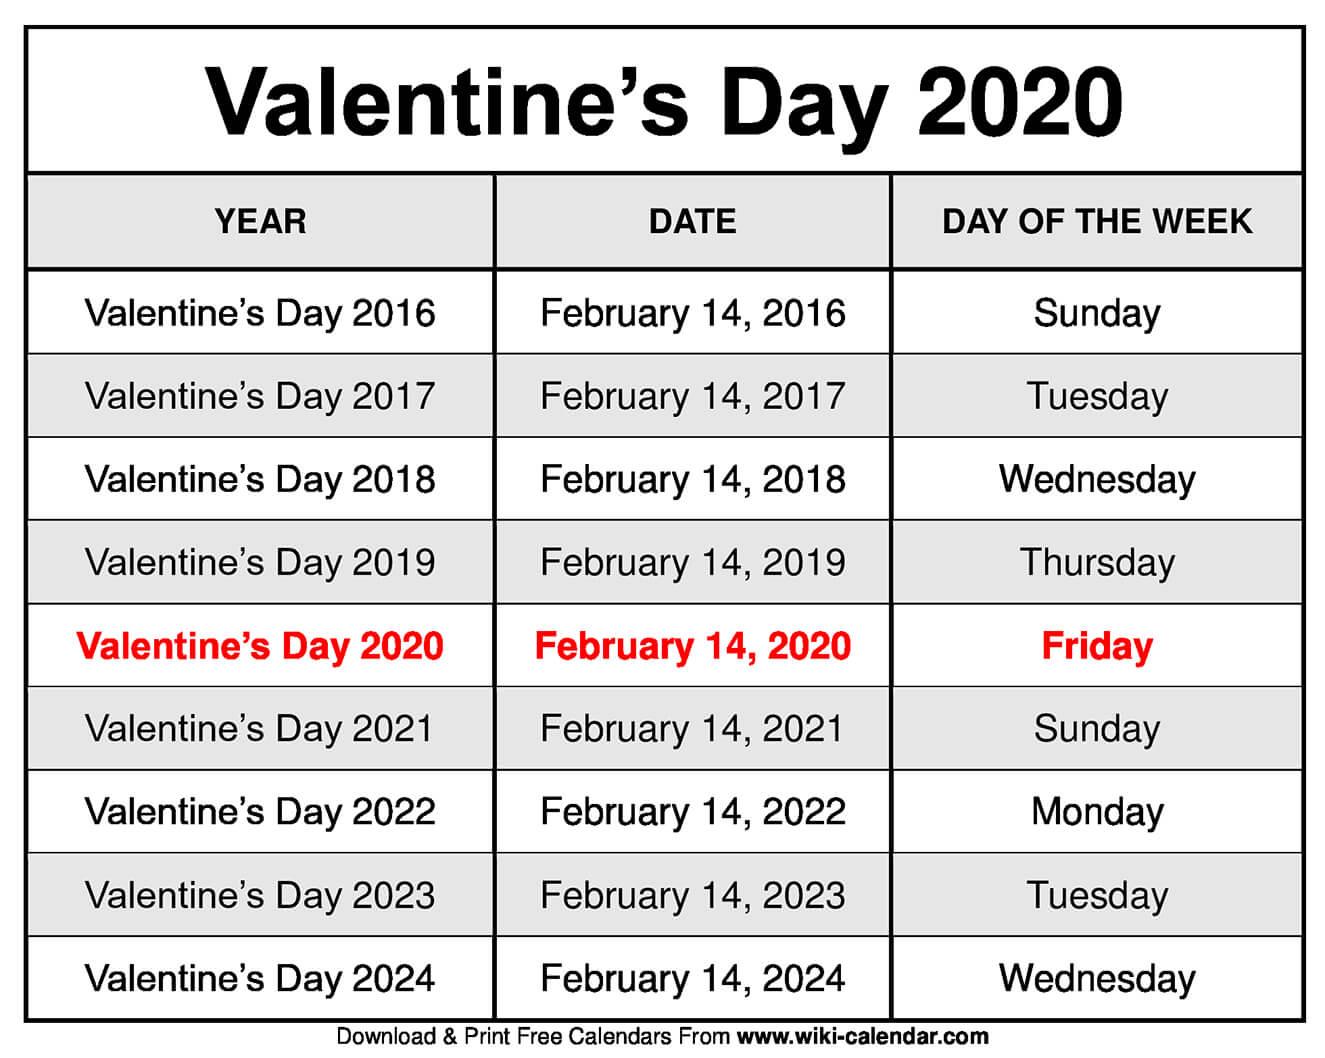 Valentine's Day 2020 Calendar